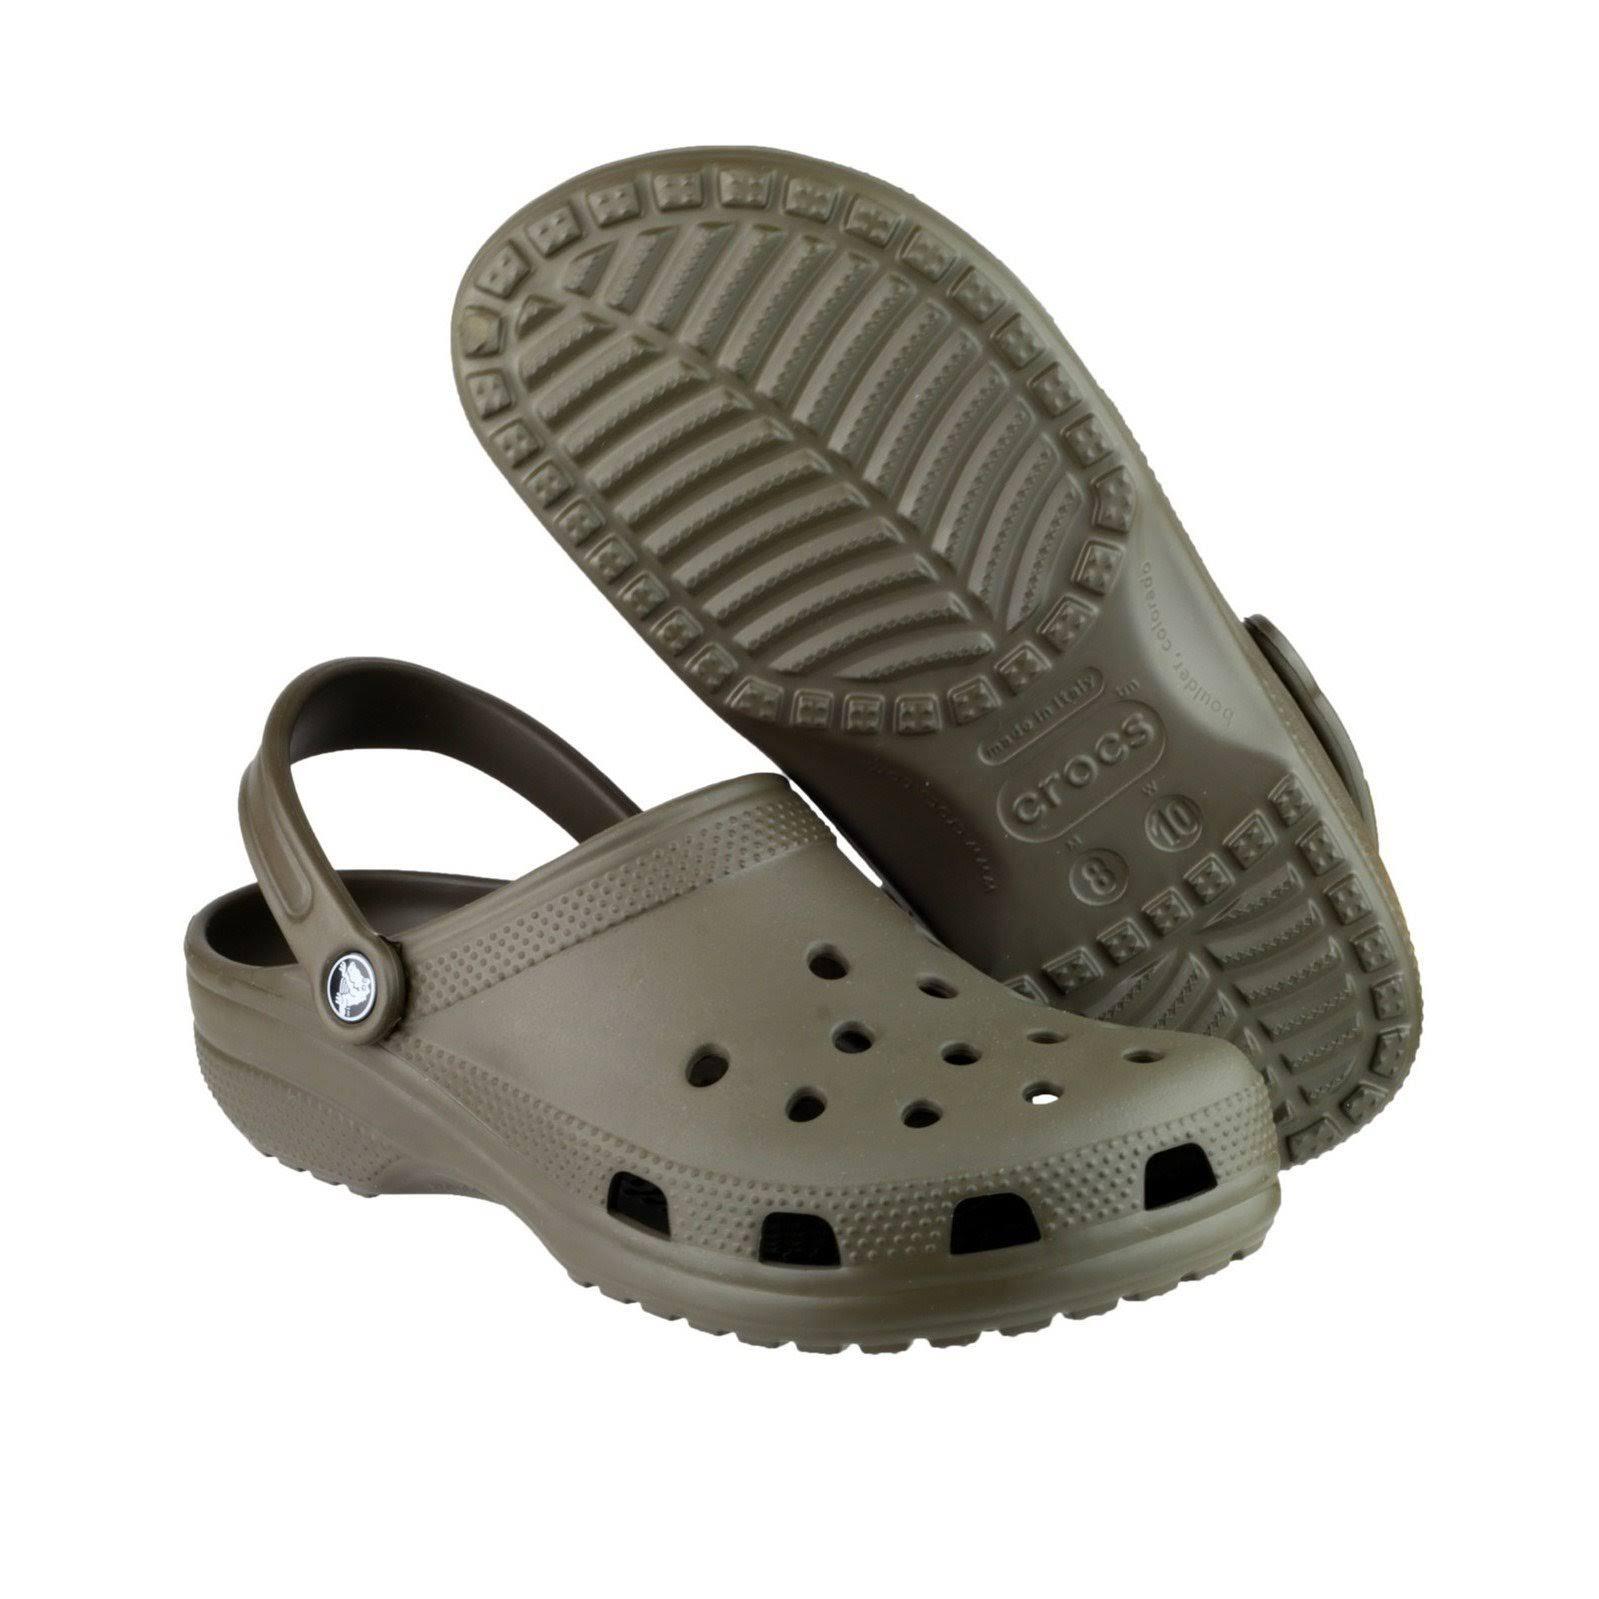 Blauw Navy Clogs Classic 14 Crocs TlKJcF1